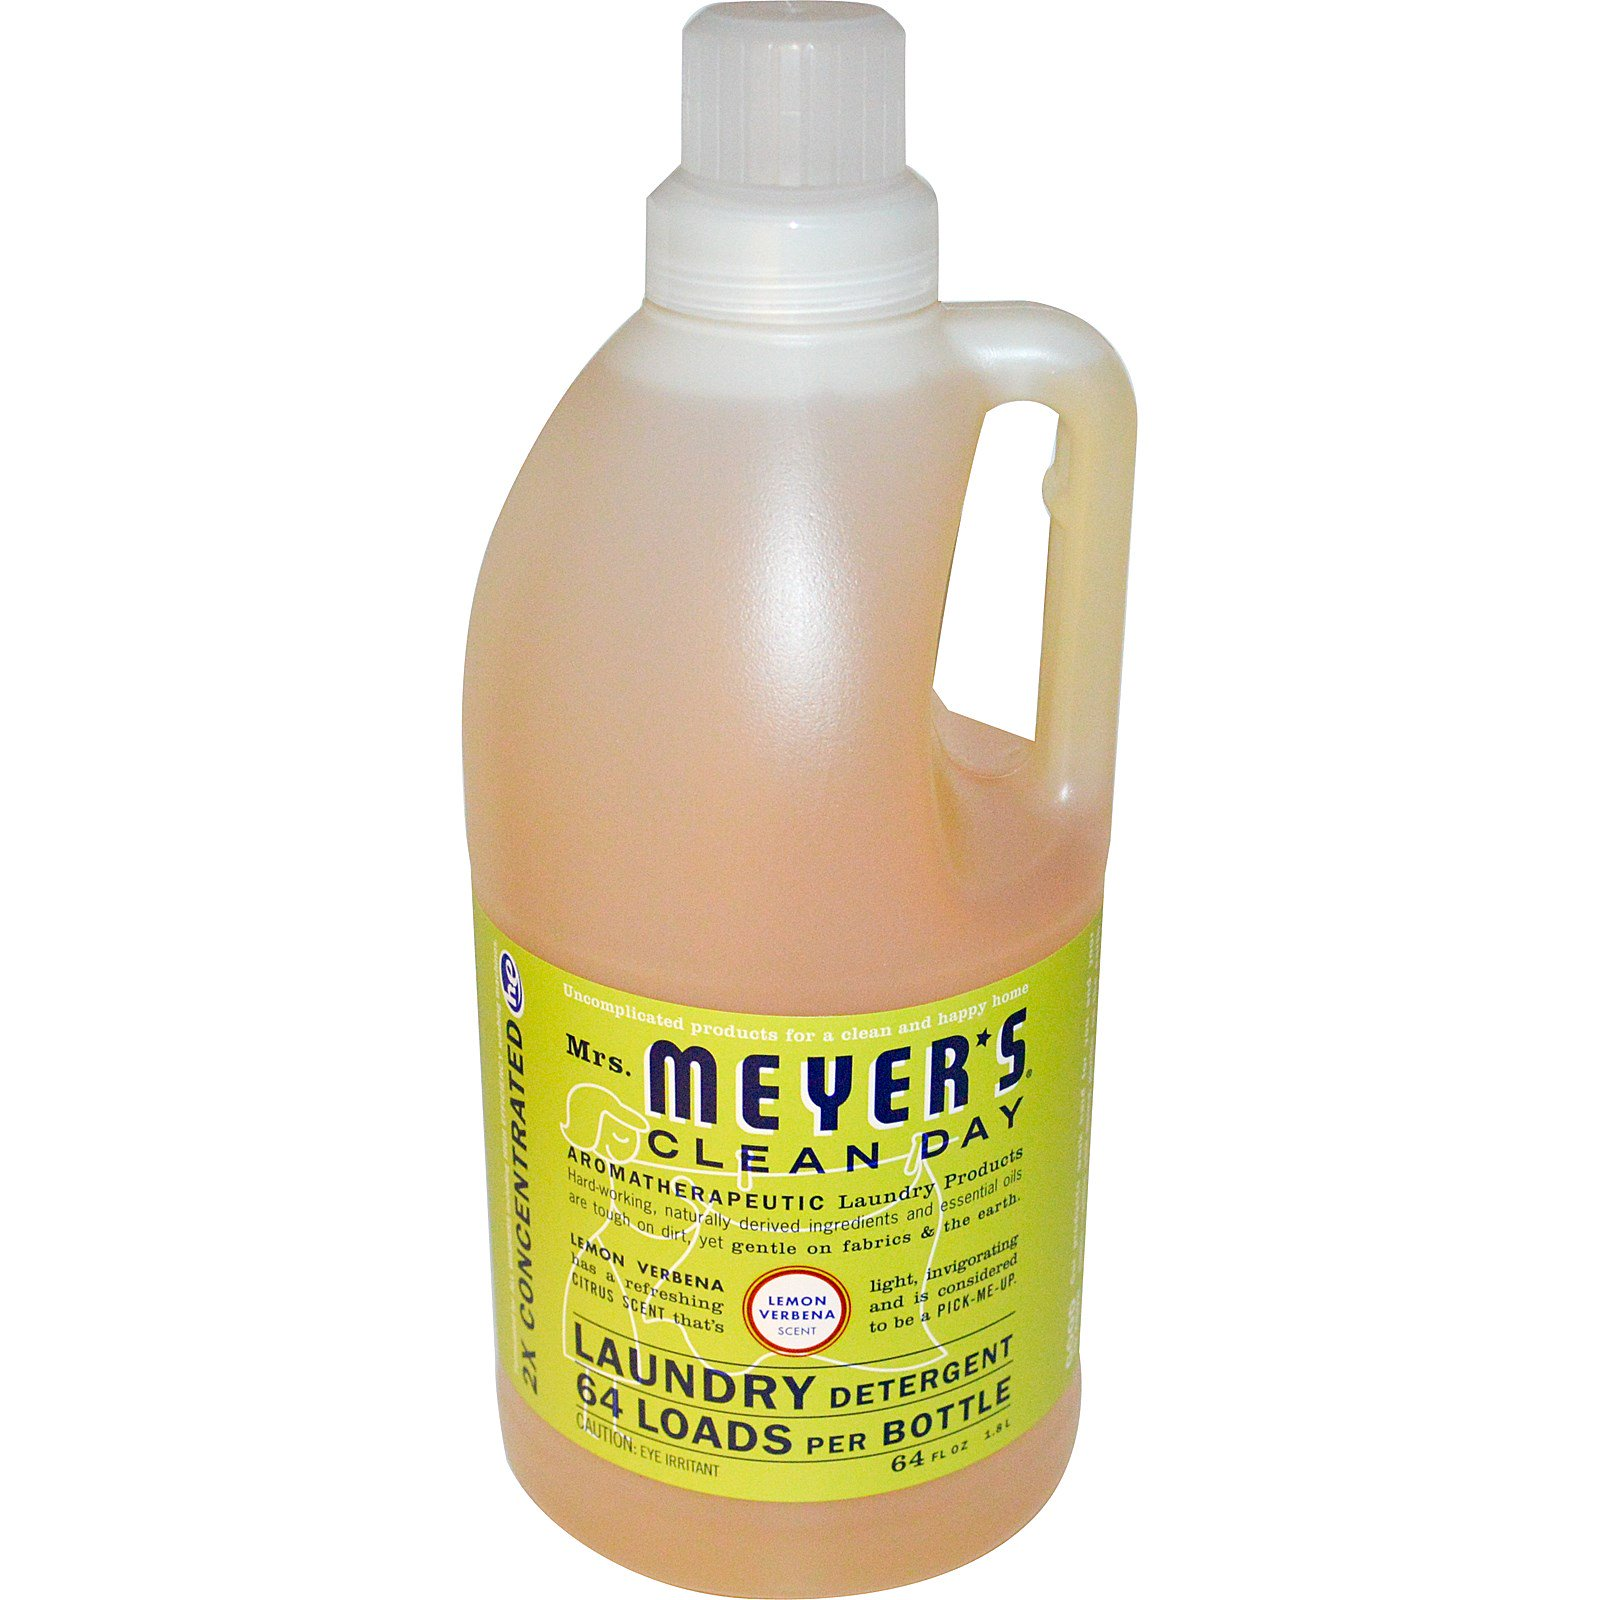 Mrs  Meyers Clean Day, Laundry Detergent, Lemon Verbena Scent, 64 Loads, 64  fl oz (1 8 L) (Discontinued Item)